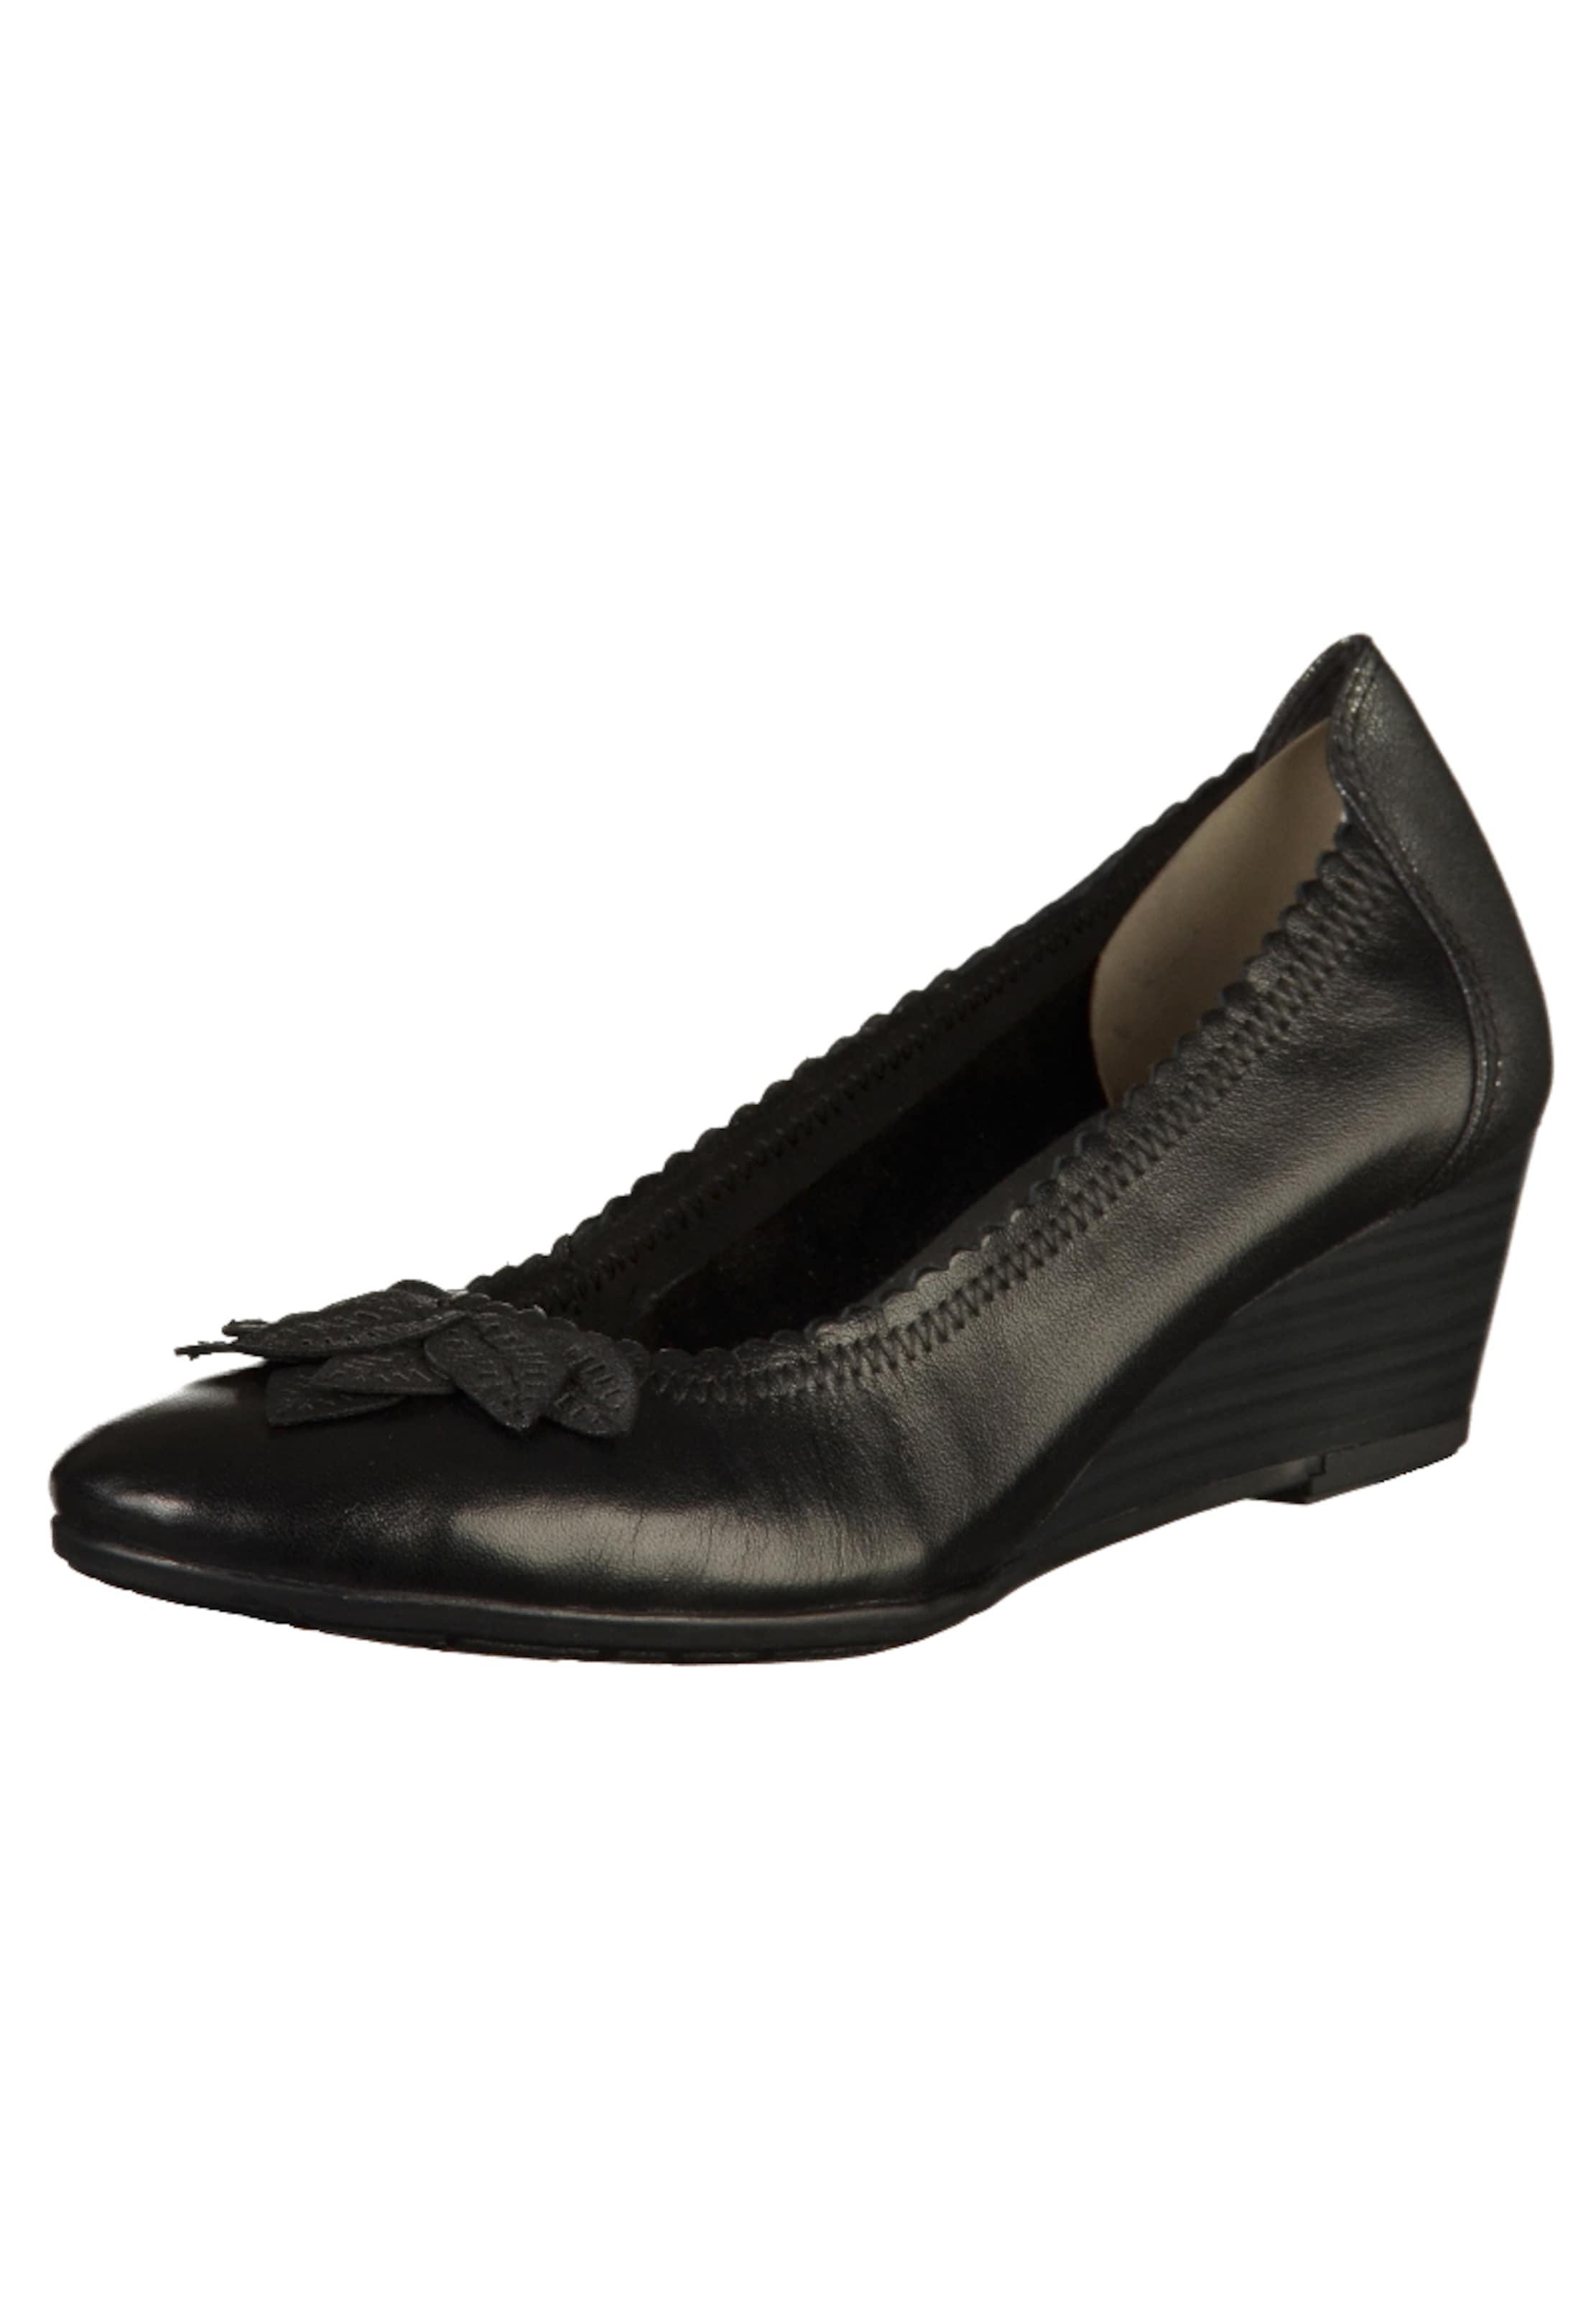 MARCO TOZZI Pumps Verschleißfeste billige Schuhe